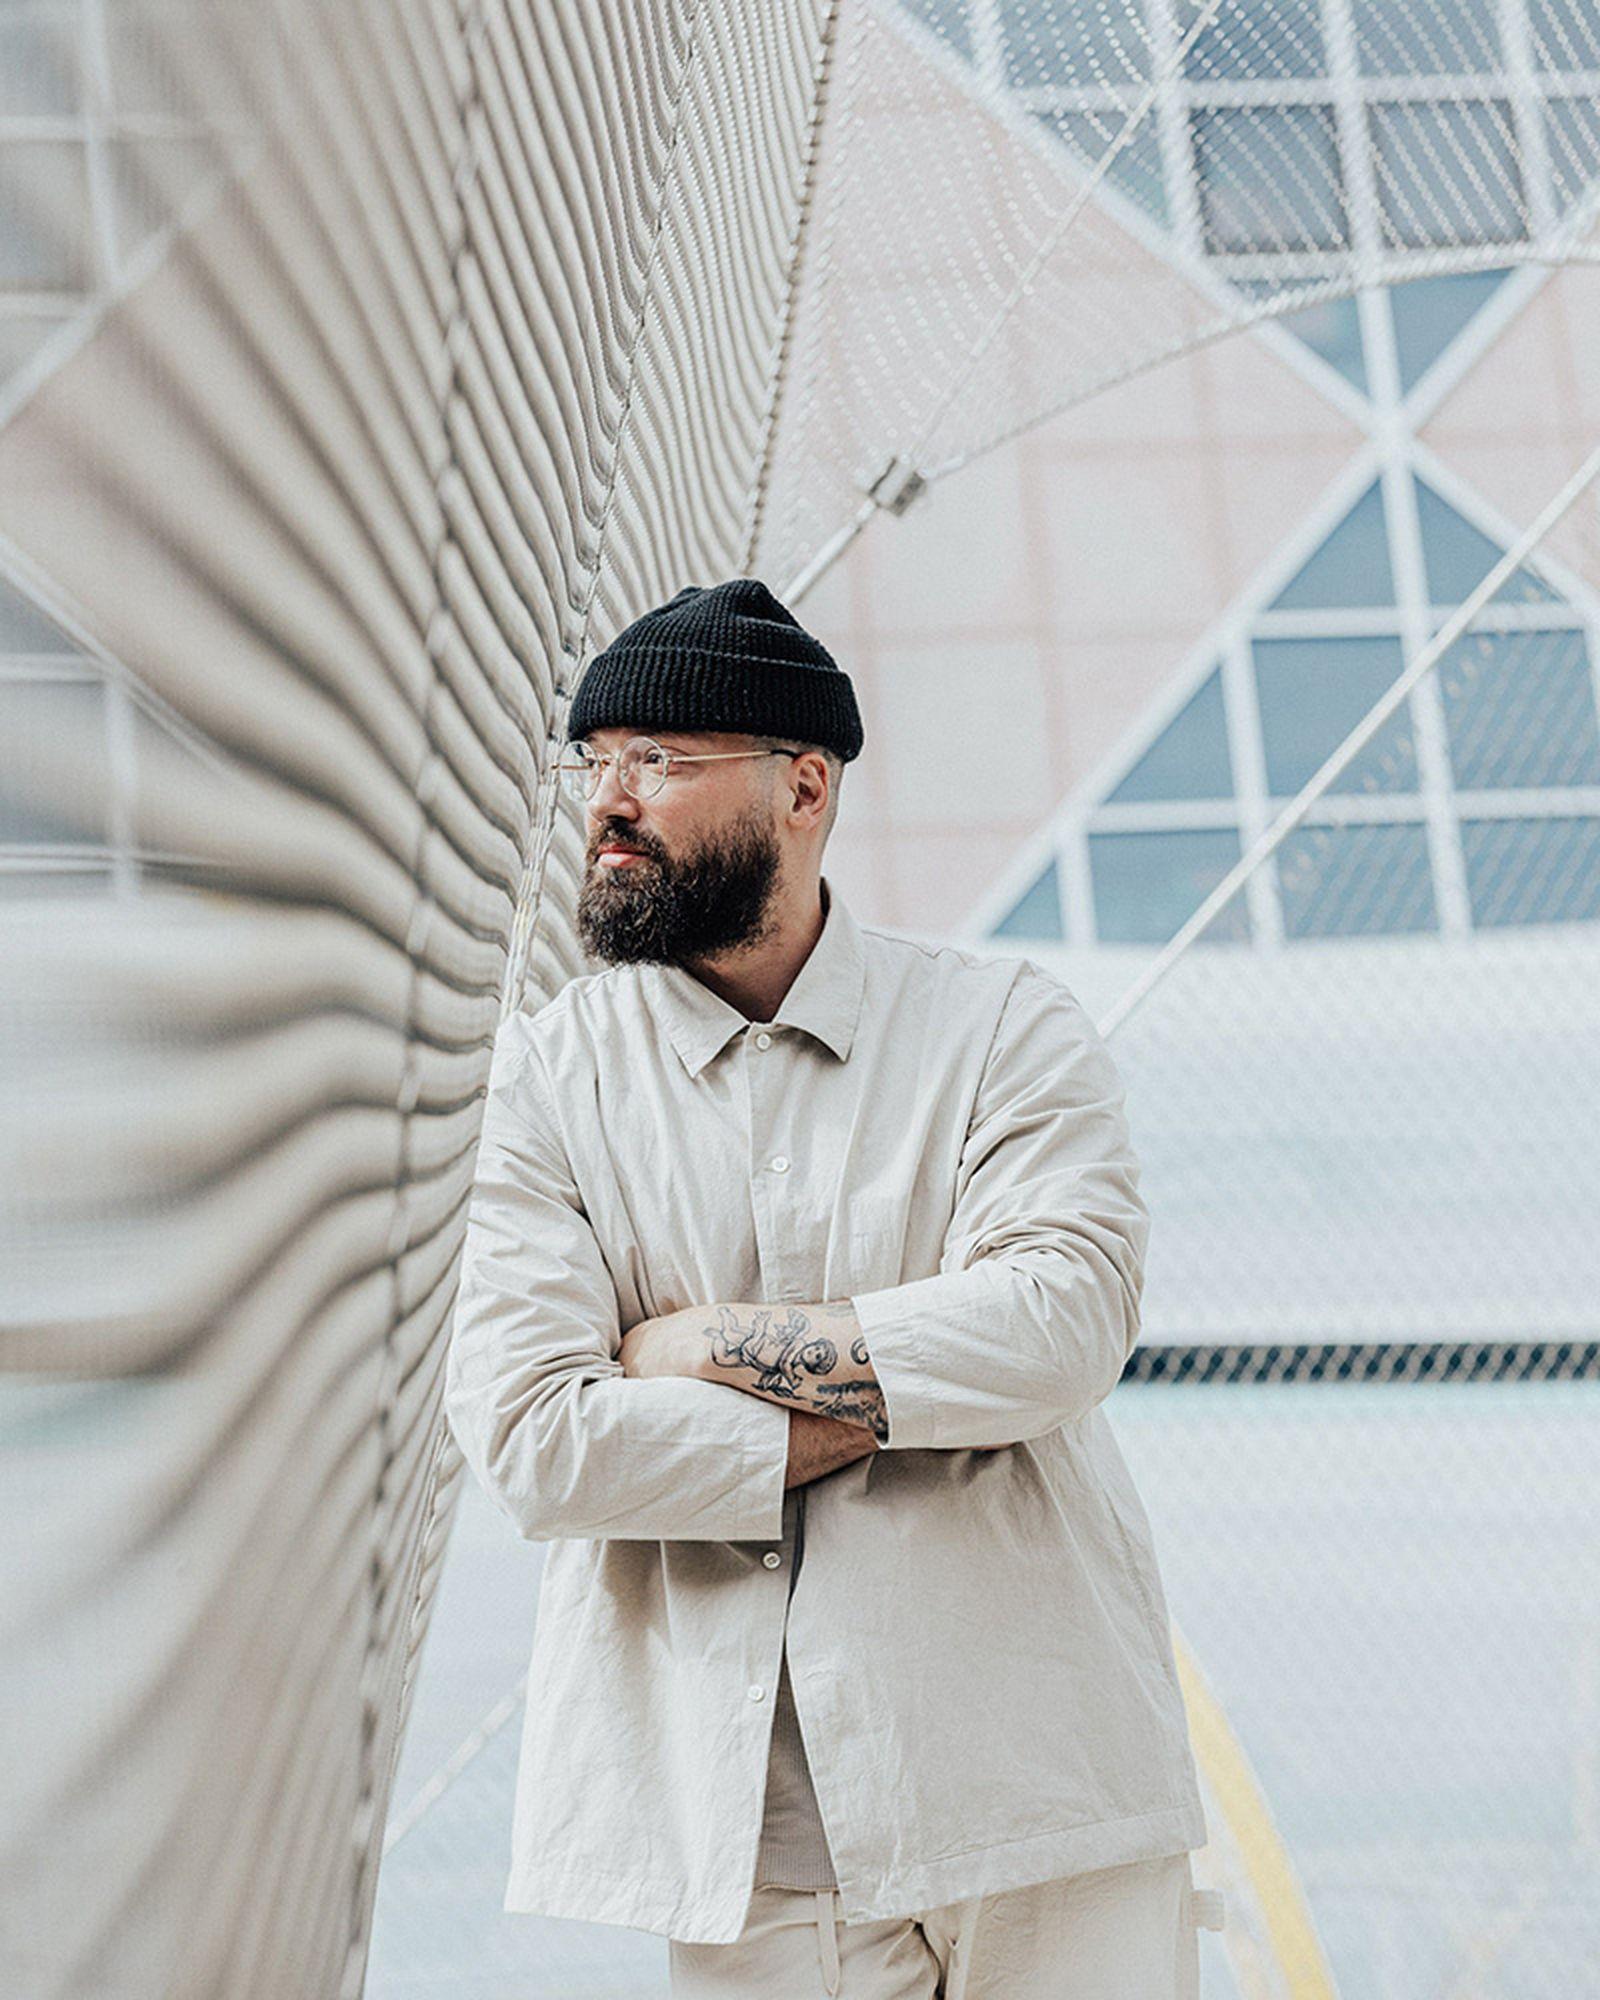 daniel-bailey-design-interview-01